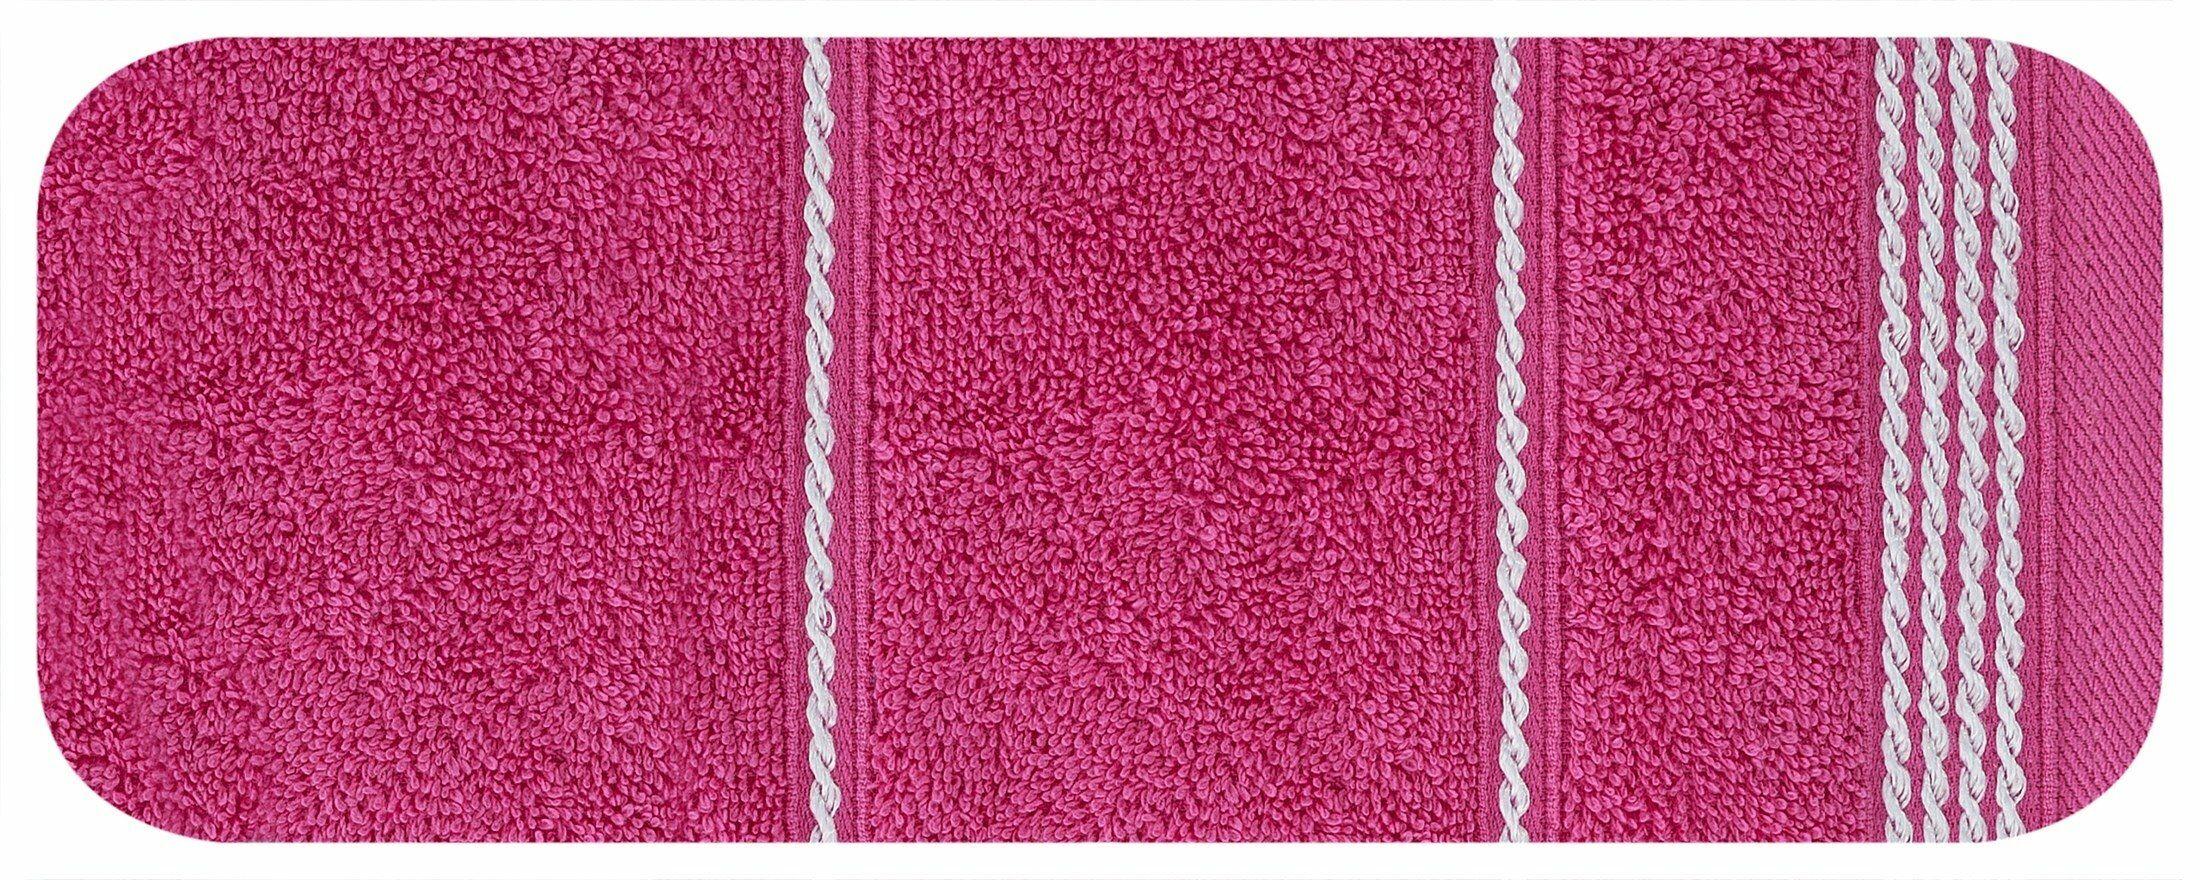 Ręcznik Mira 30x50 różowy 14 frotte 500 g/m2 Eurofirany